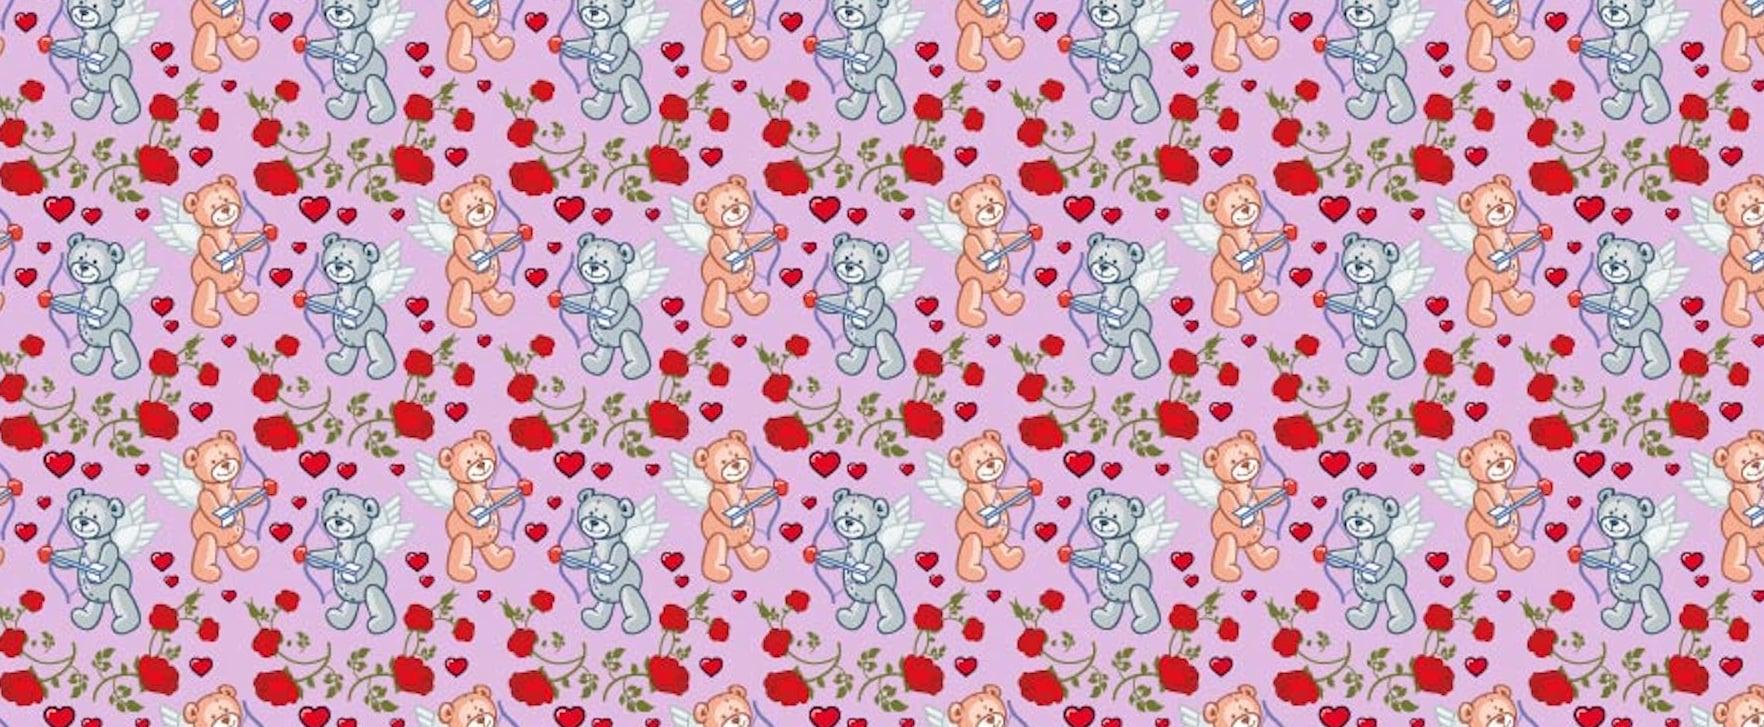 This Valentine's Day Teddy Bear Brain Teaser Is So Tricky